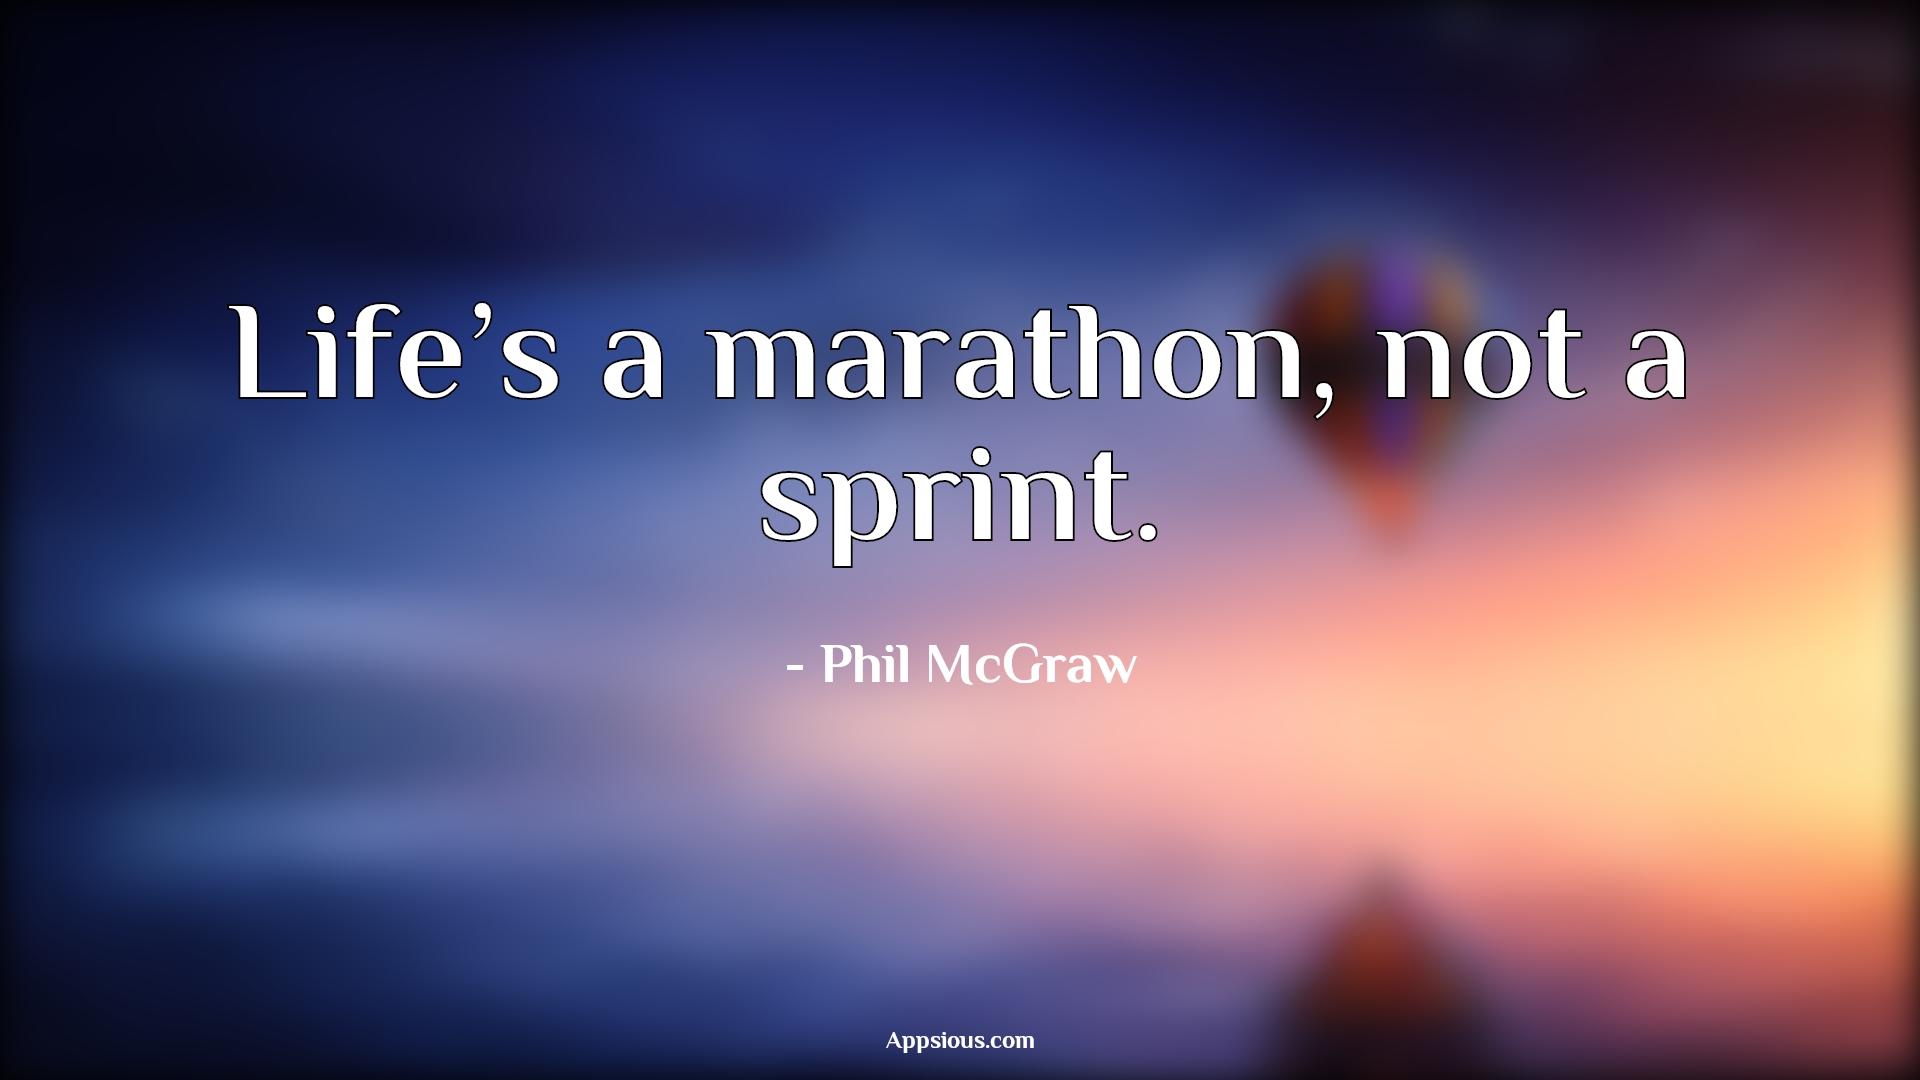 Life's a marathon, not a sprint.